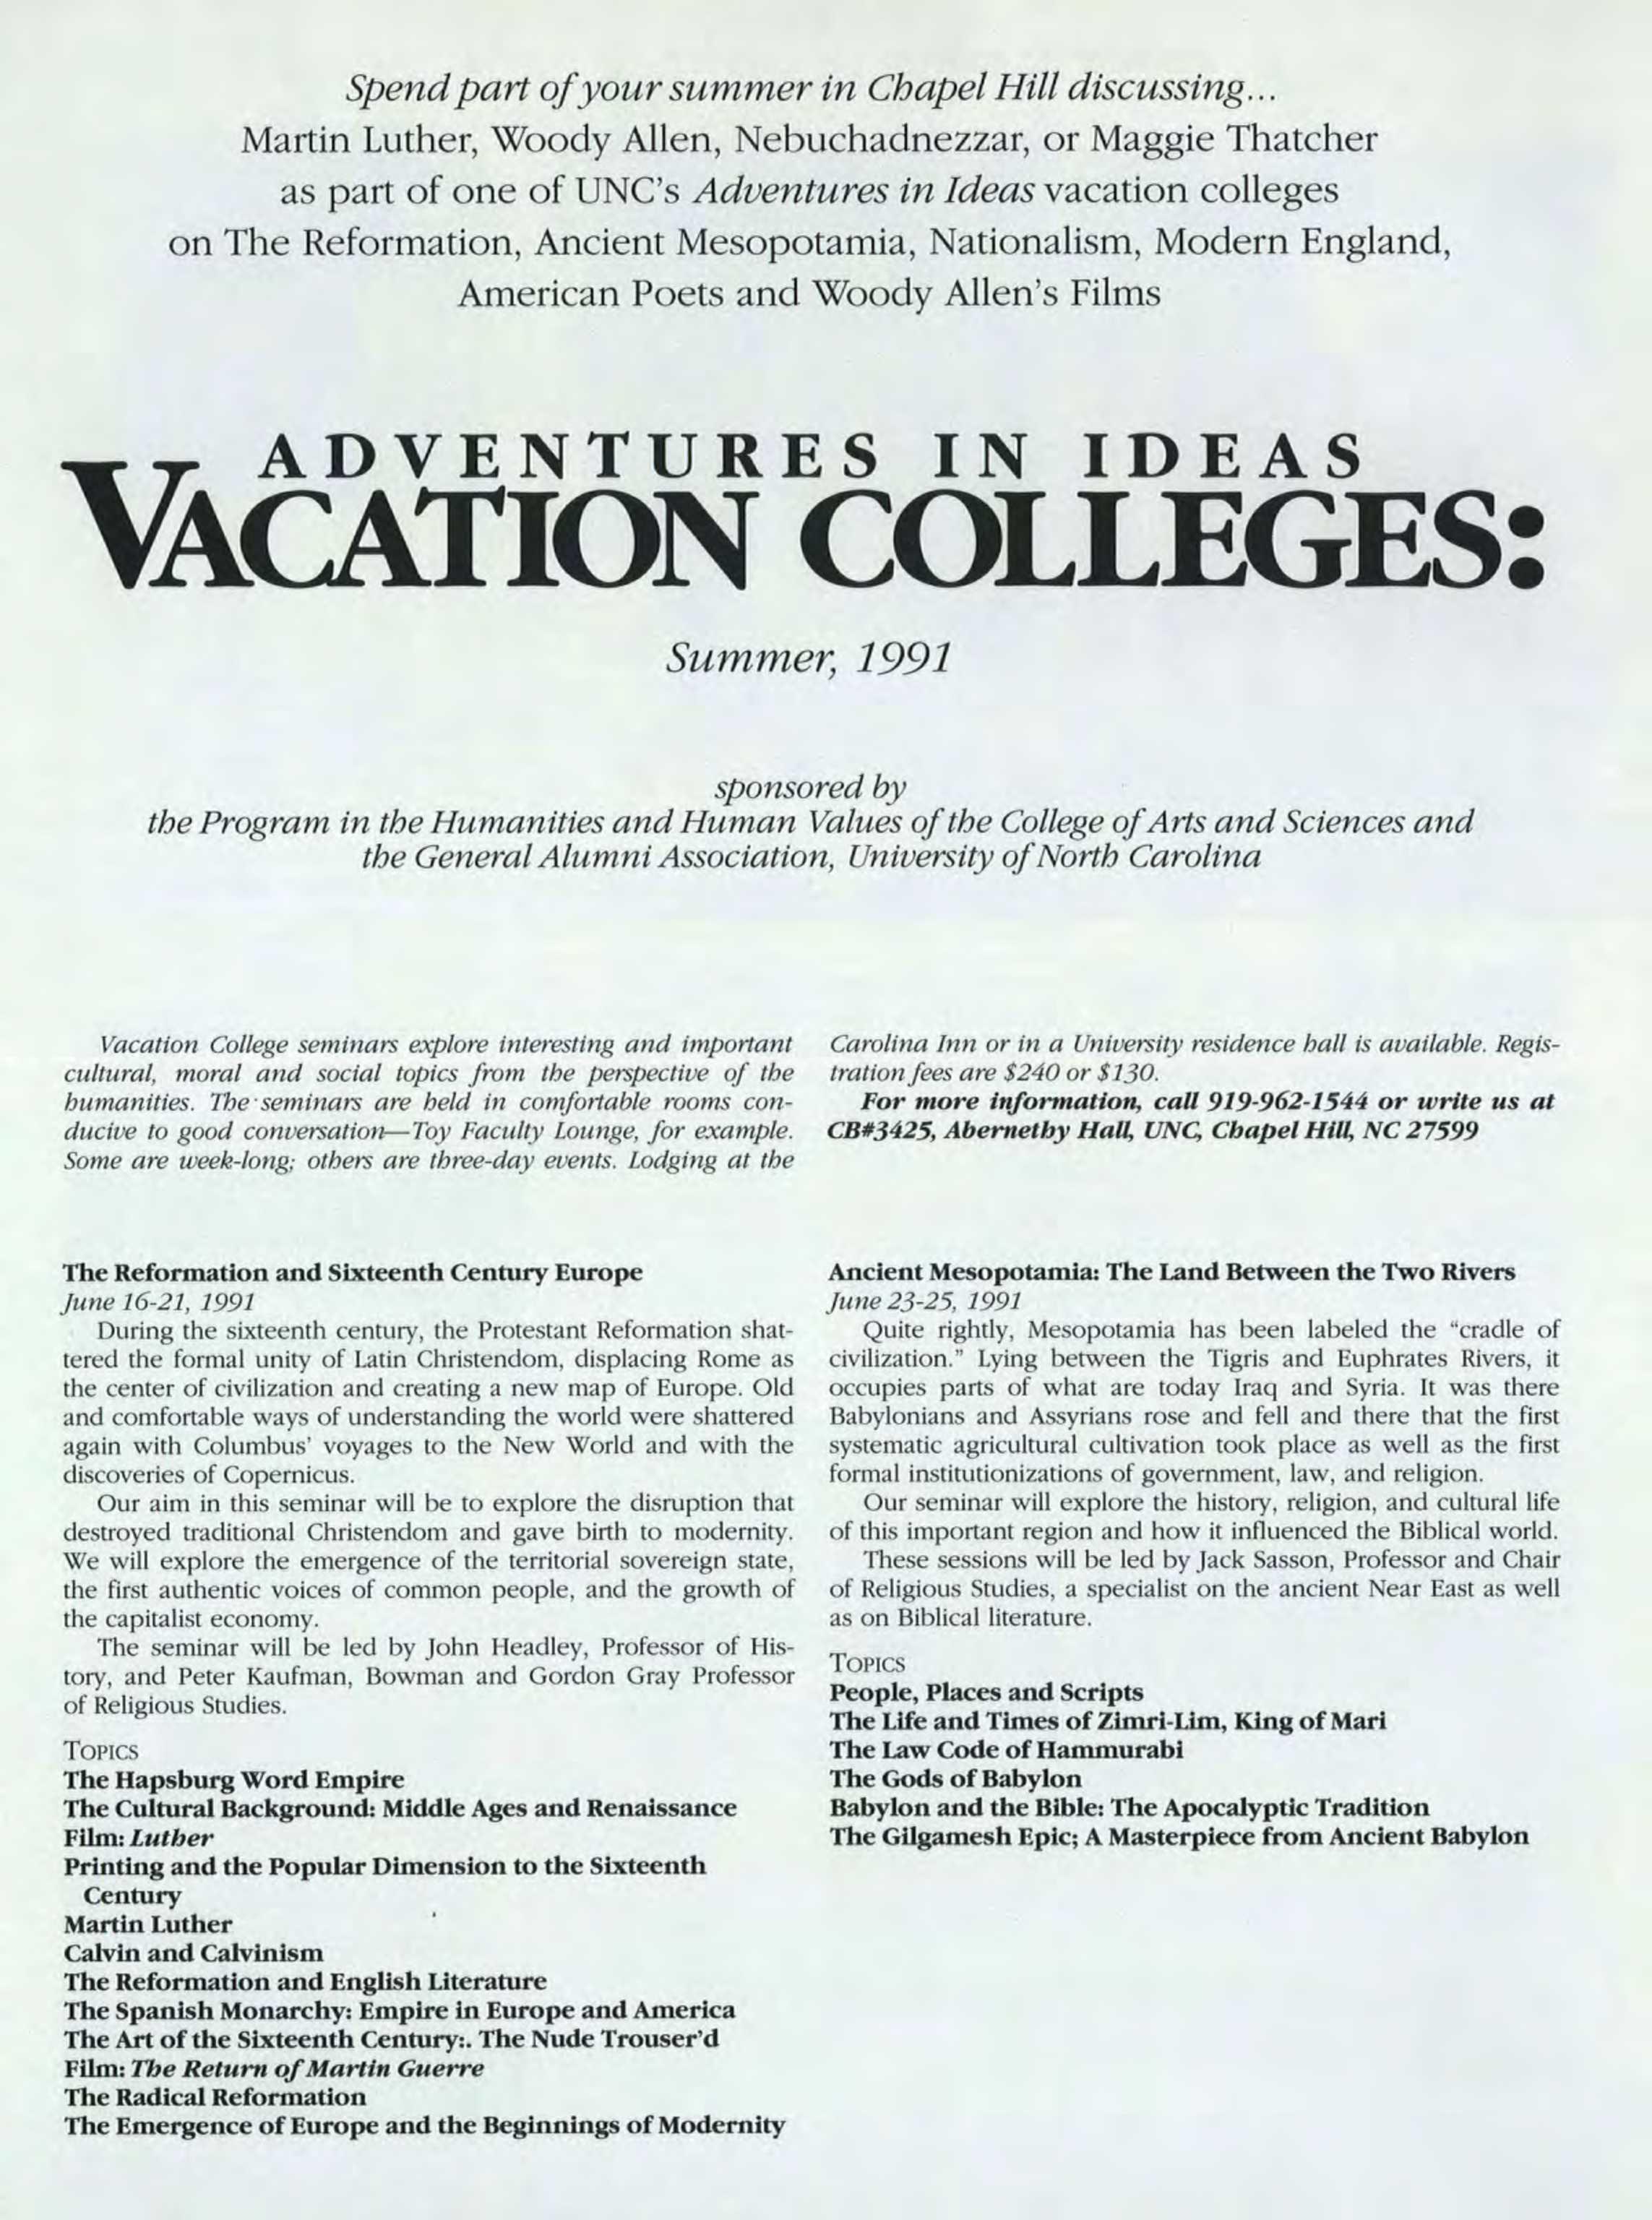 Carolina Alumni Review - Spring 1994 - page 50